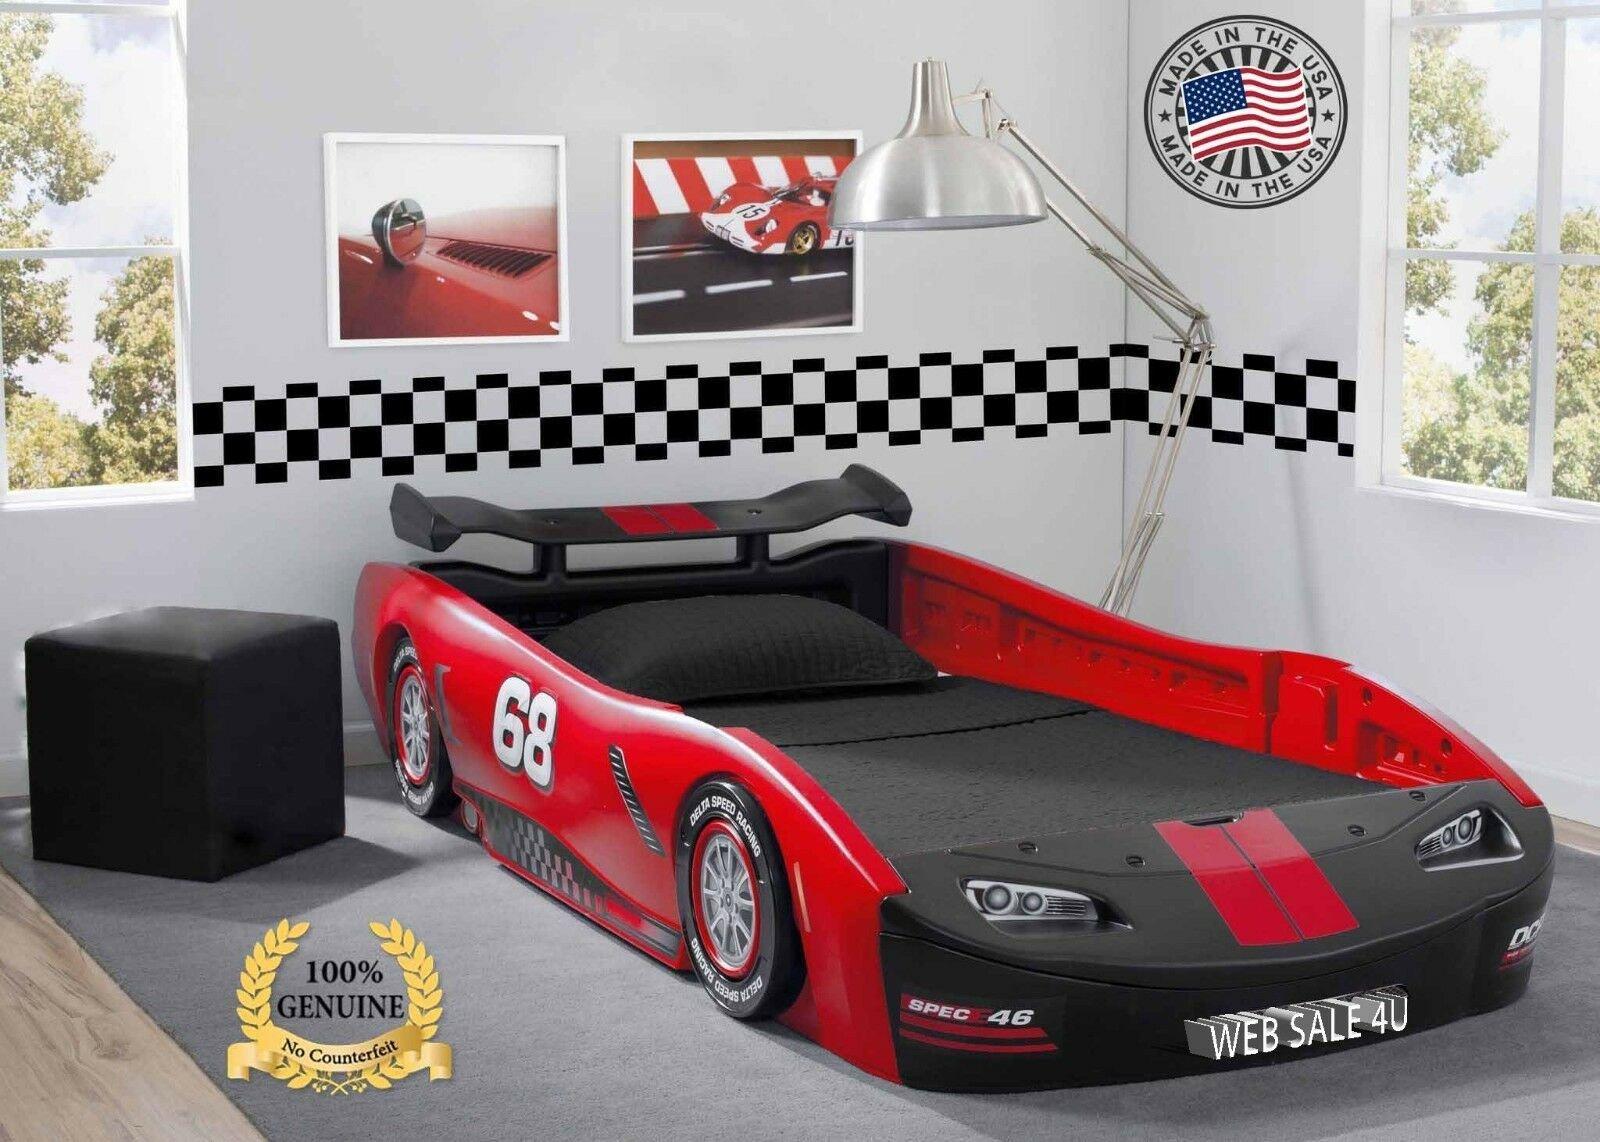 Lightning Mcqueen Bedroom Set Fresh Kids Bed Twin Car toddler Bedroom Furniture Race Children Turbo Delta Gift Usa